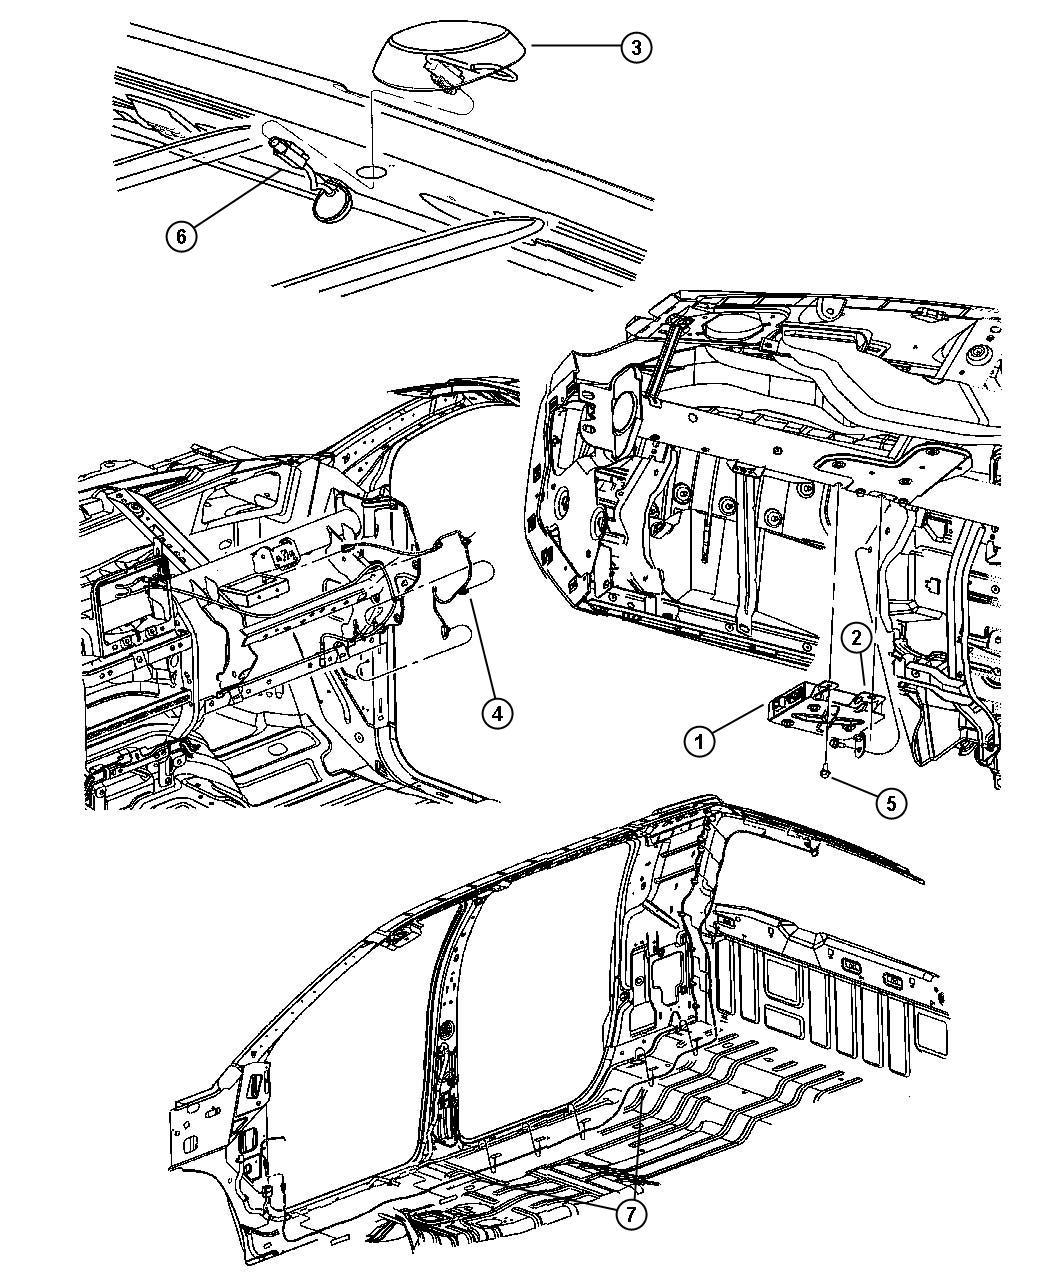 Dodge Ram 3500 Bracket. Satellite receiver. Radio, sirius